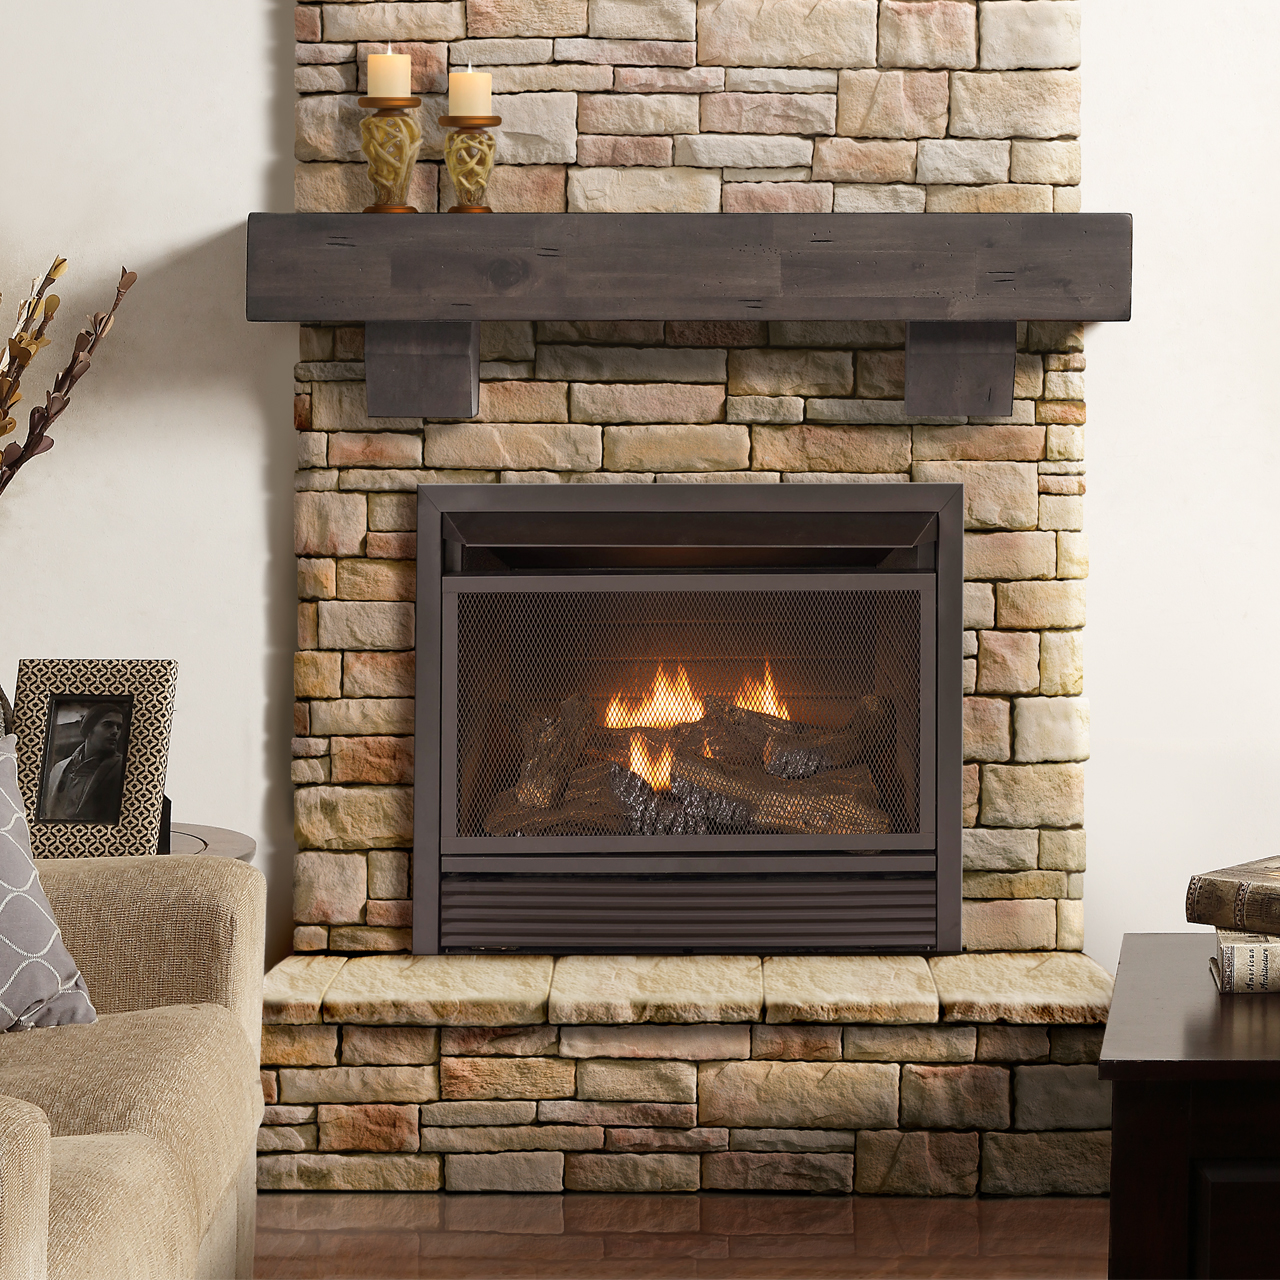 Procom Fireplaces 29 in Ventless Dual Fuel Firebox Insert